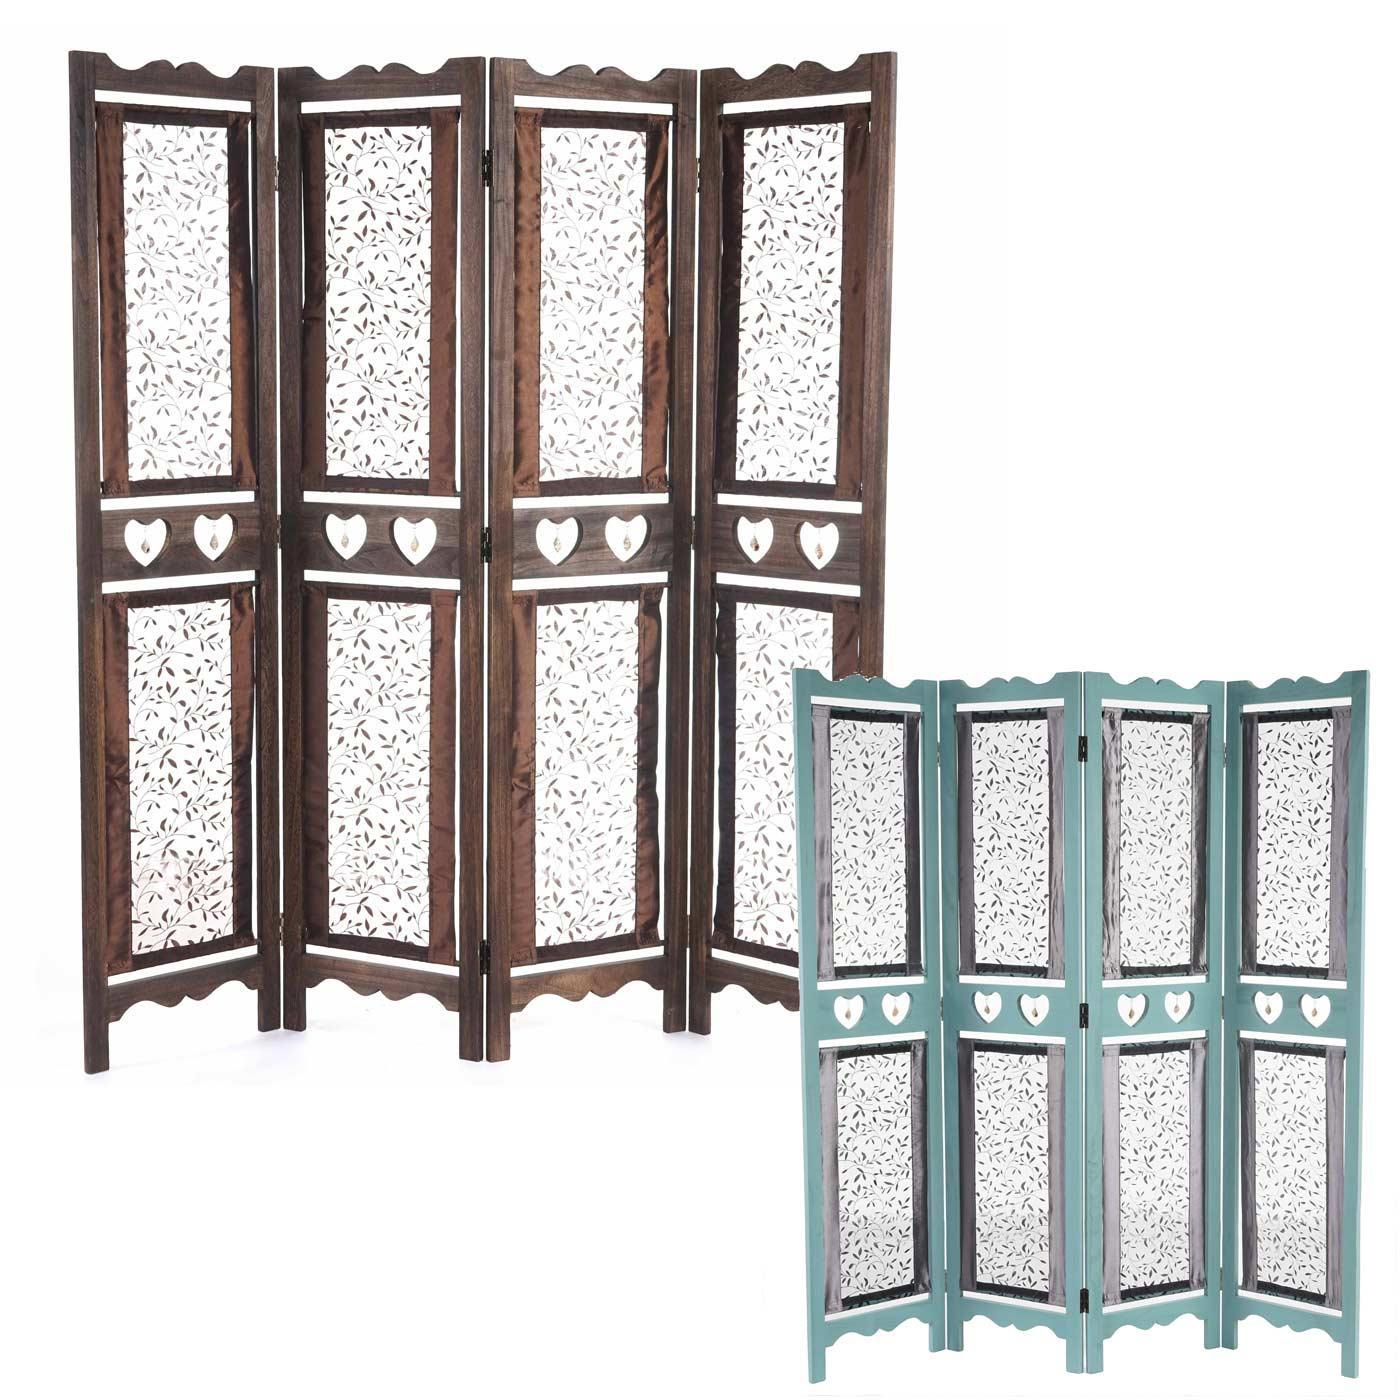 sichtschutz terrasse textil kreatives haus design. Black Bedroom Furniture Sets. Home Design Ideas